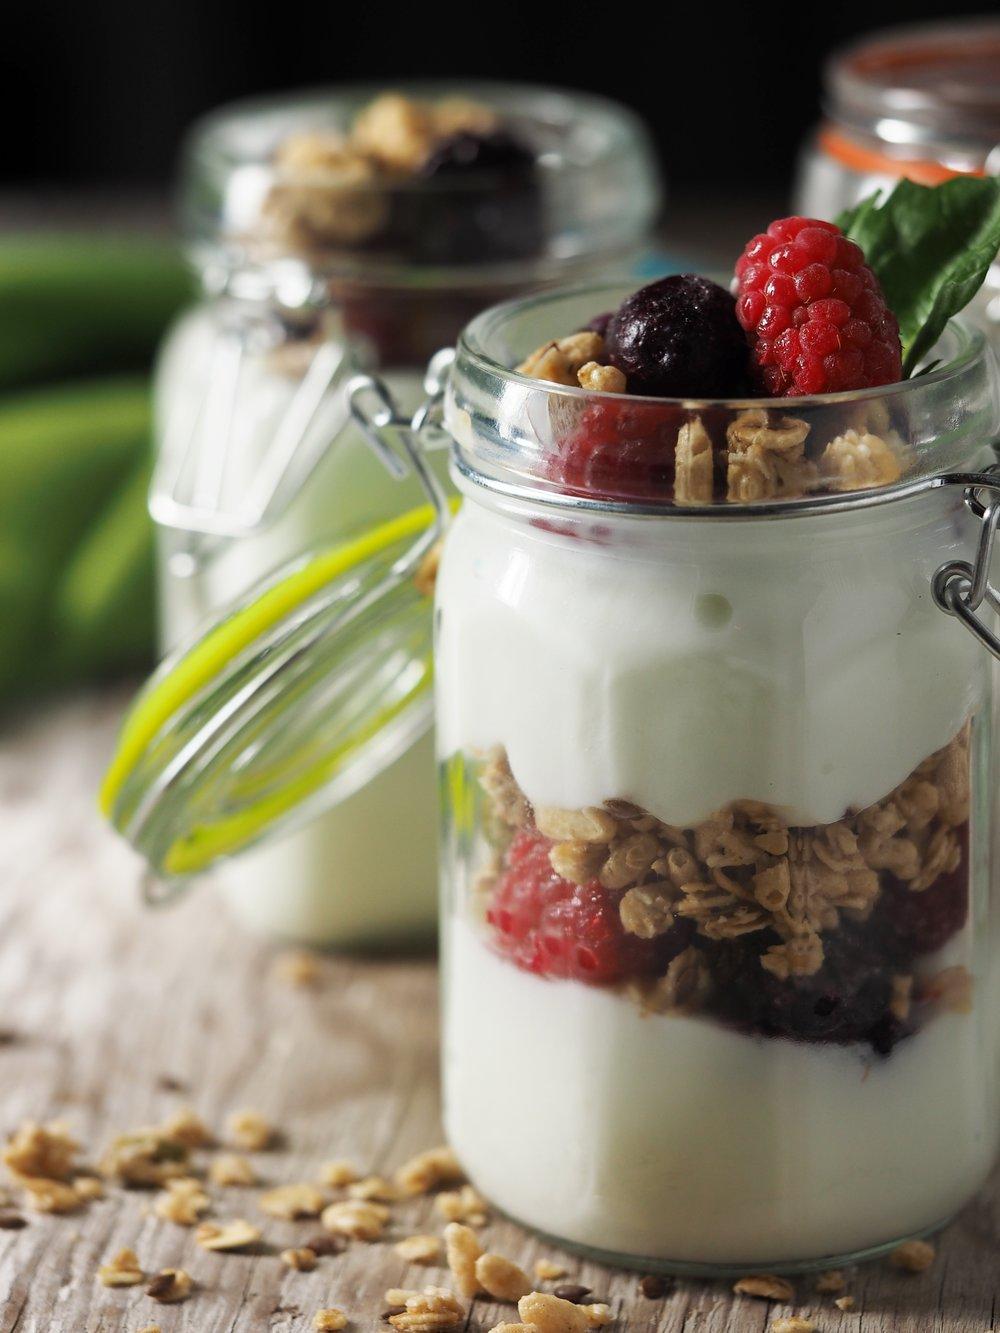 Fruit Fresh Berries Glass Parfait Yogurt Nuts